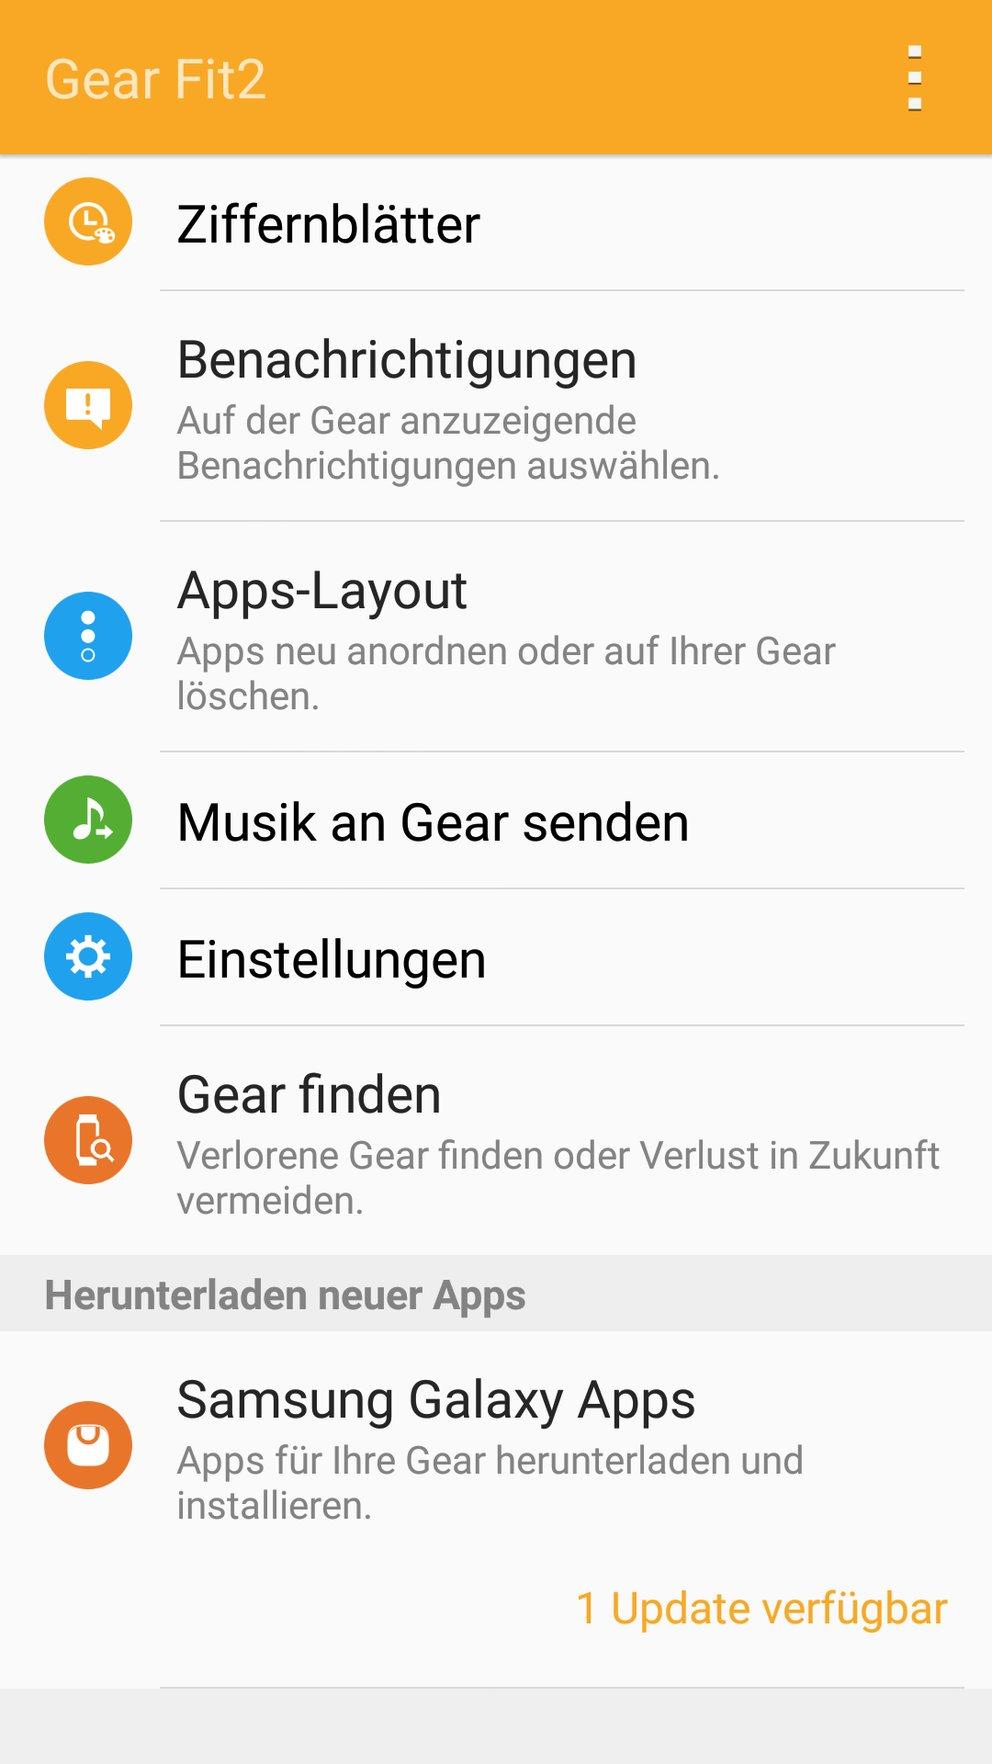 Samsung-Gear-Fit-2-Screen4